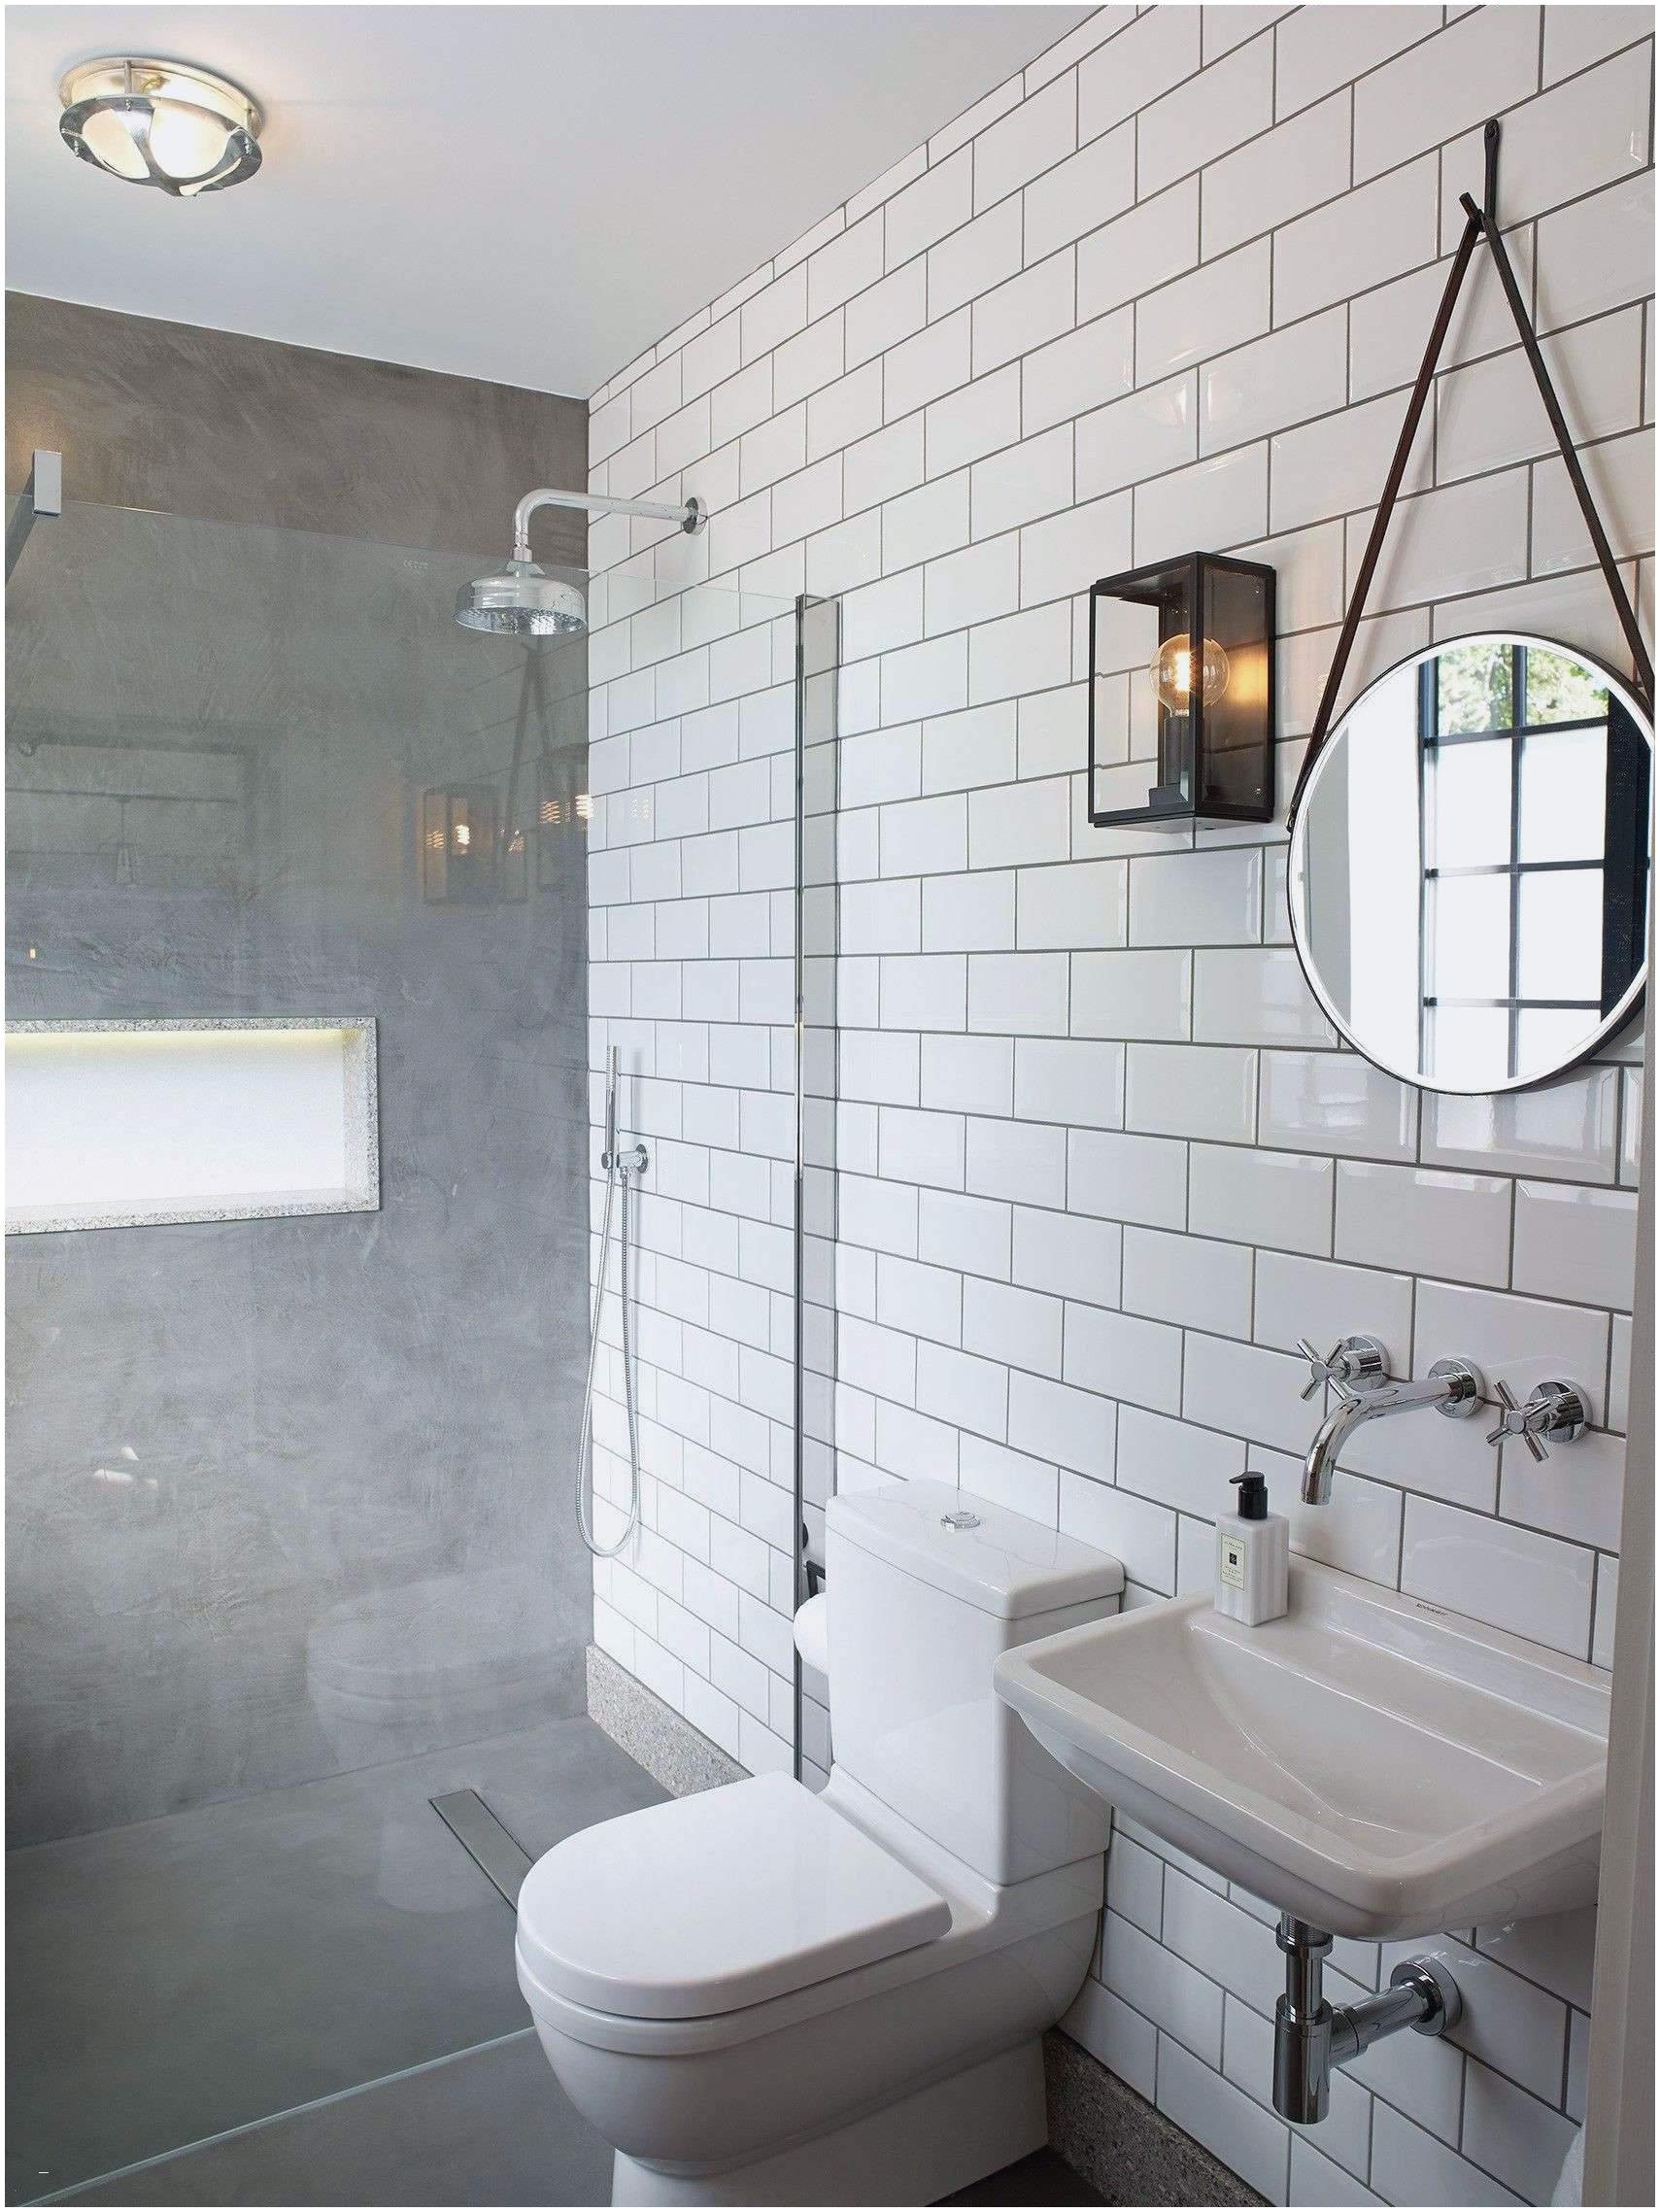 bathroom floor tiles ideas fantastic home art designs about bathroom wall decor ideas incredible tag toilet ideas 0d mucsat awesome fantastic home art designs about bathroom wall decor ideas